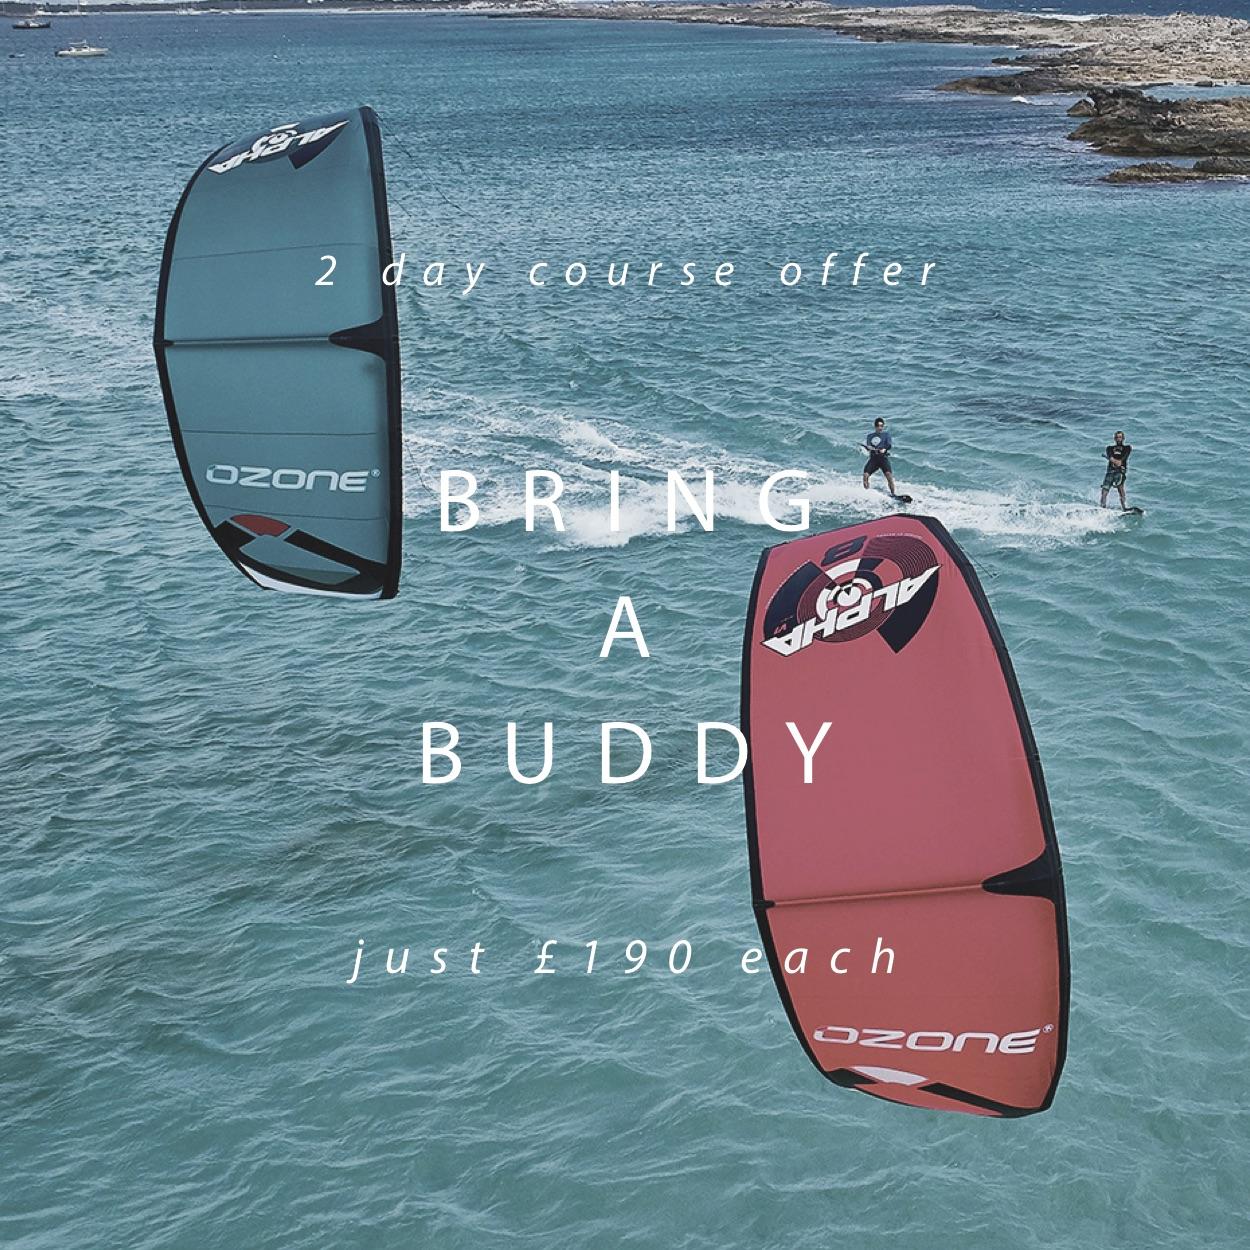 Bring_A_Buddy_Social_Post.jpg